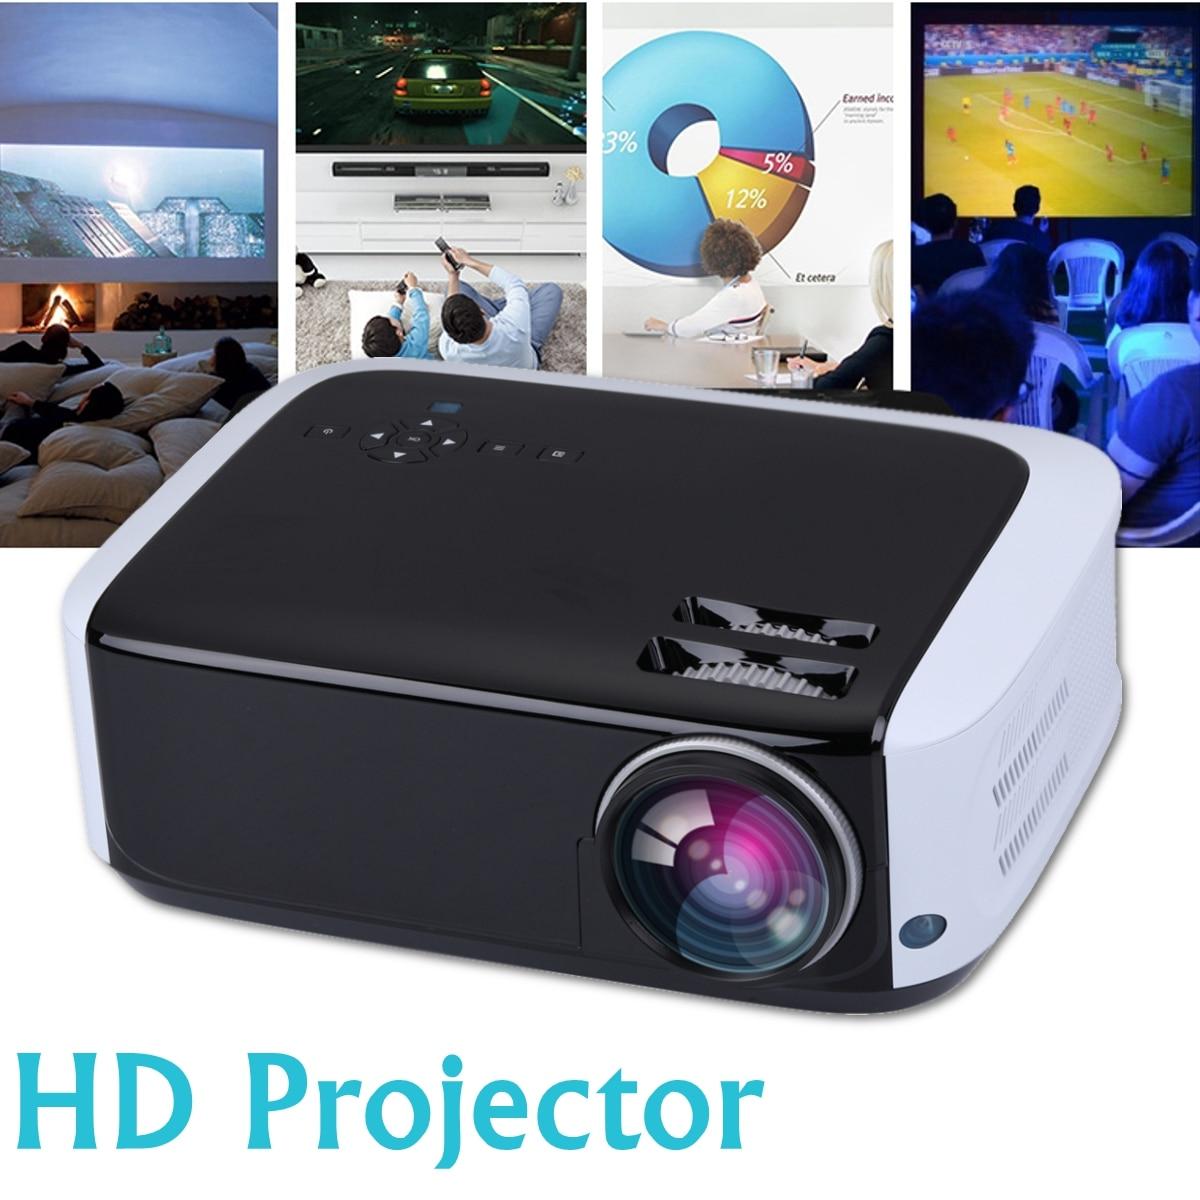 Portable EU Plug HD 1080P 3D LED Mini Projector 10000 lumens1080P 1280*768 Multimedia Contast ratio 3000:1 for Home CinemaPortable EU Plug HD 1080P 3D LED Mini Projector 10000 lumens1080P 1280*768 Multimedia Contast ratio 3000:1 for Home Cinema